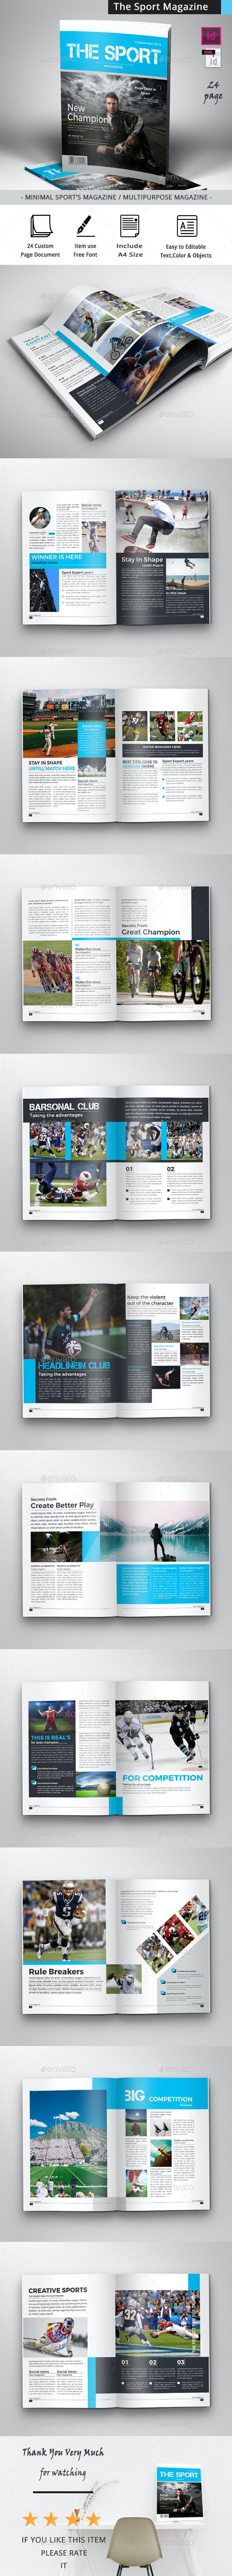 The Sport Magazine - Magazines Print Templates